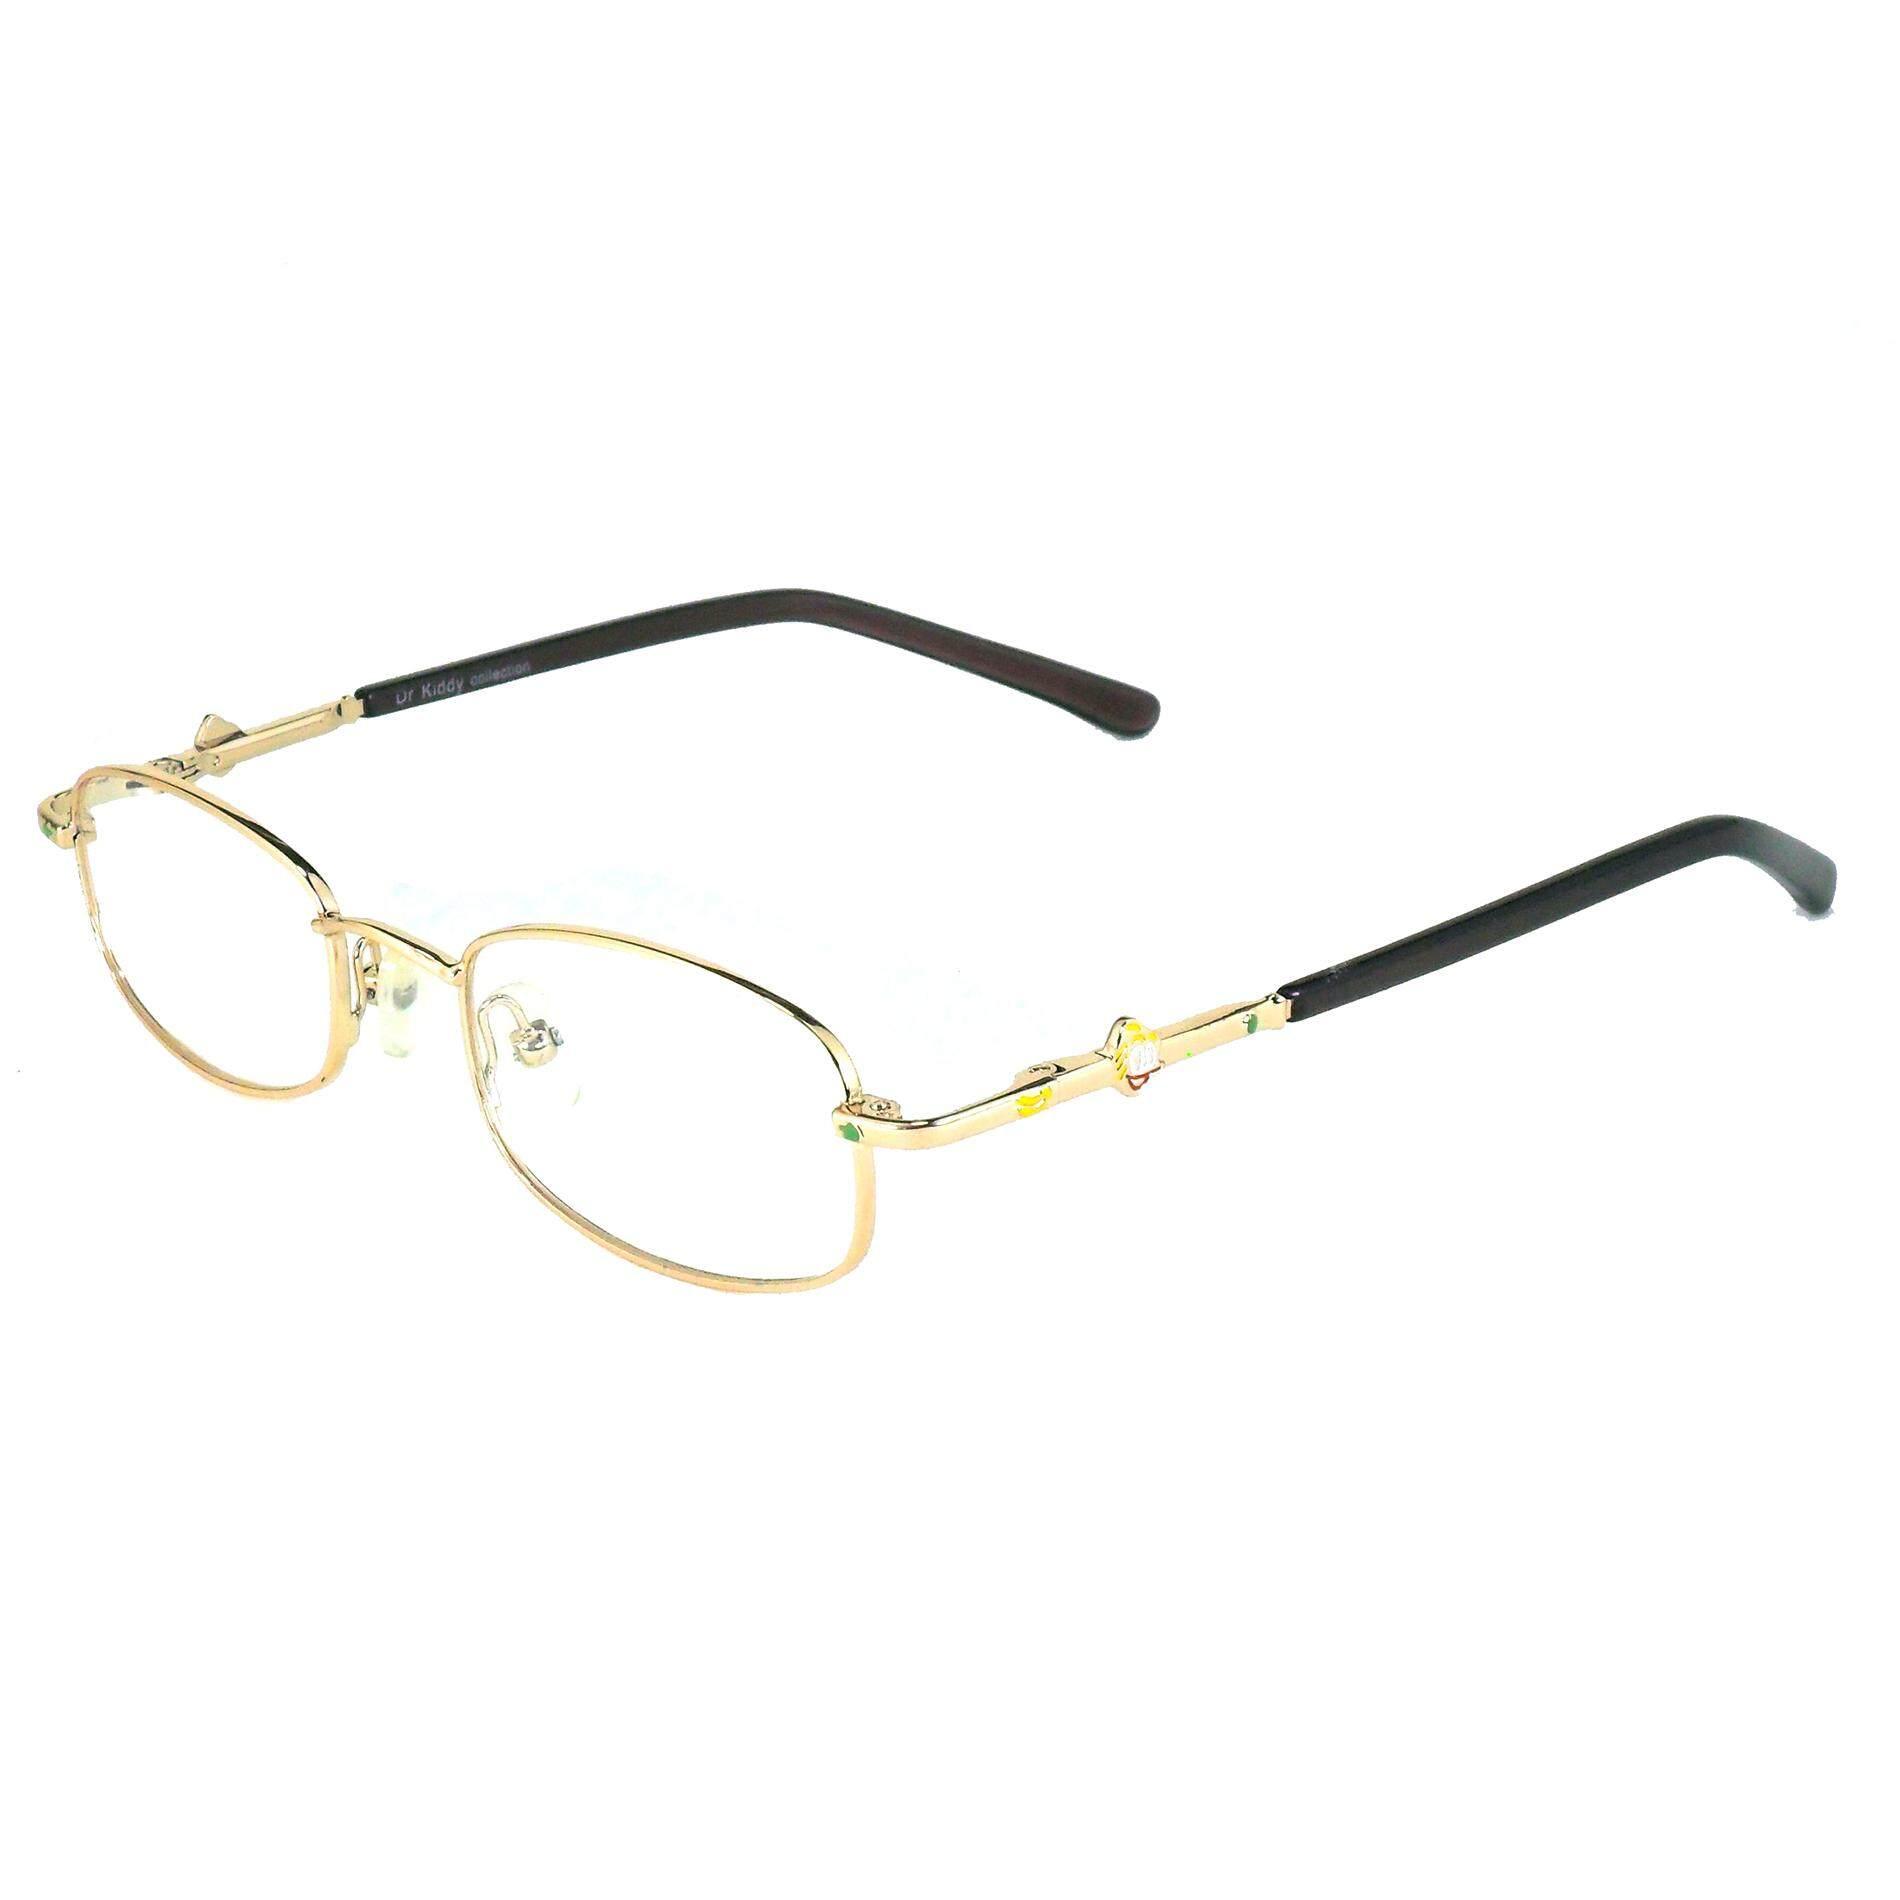 Korea Children Glasses แว่นตาแฟชั่นเด็ก แว่นตาเด็ก รุ่น 0099 ขาสปริง วัสดุ สแตนเลสสตีล หรือเหล็กกล้าไร้สนิม Stainless Steel Kid Eyewear (สำหรับตัดเลนส์) เบาสวมไส่สบาย By See Too You.